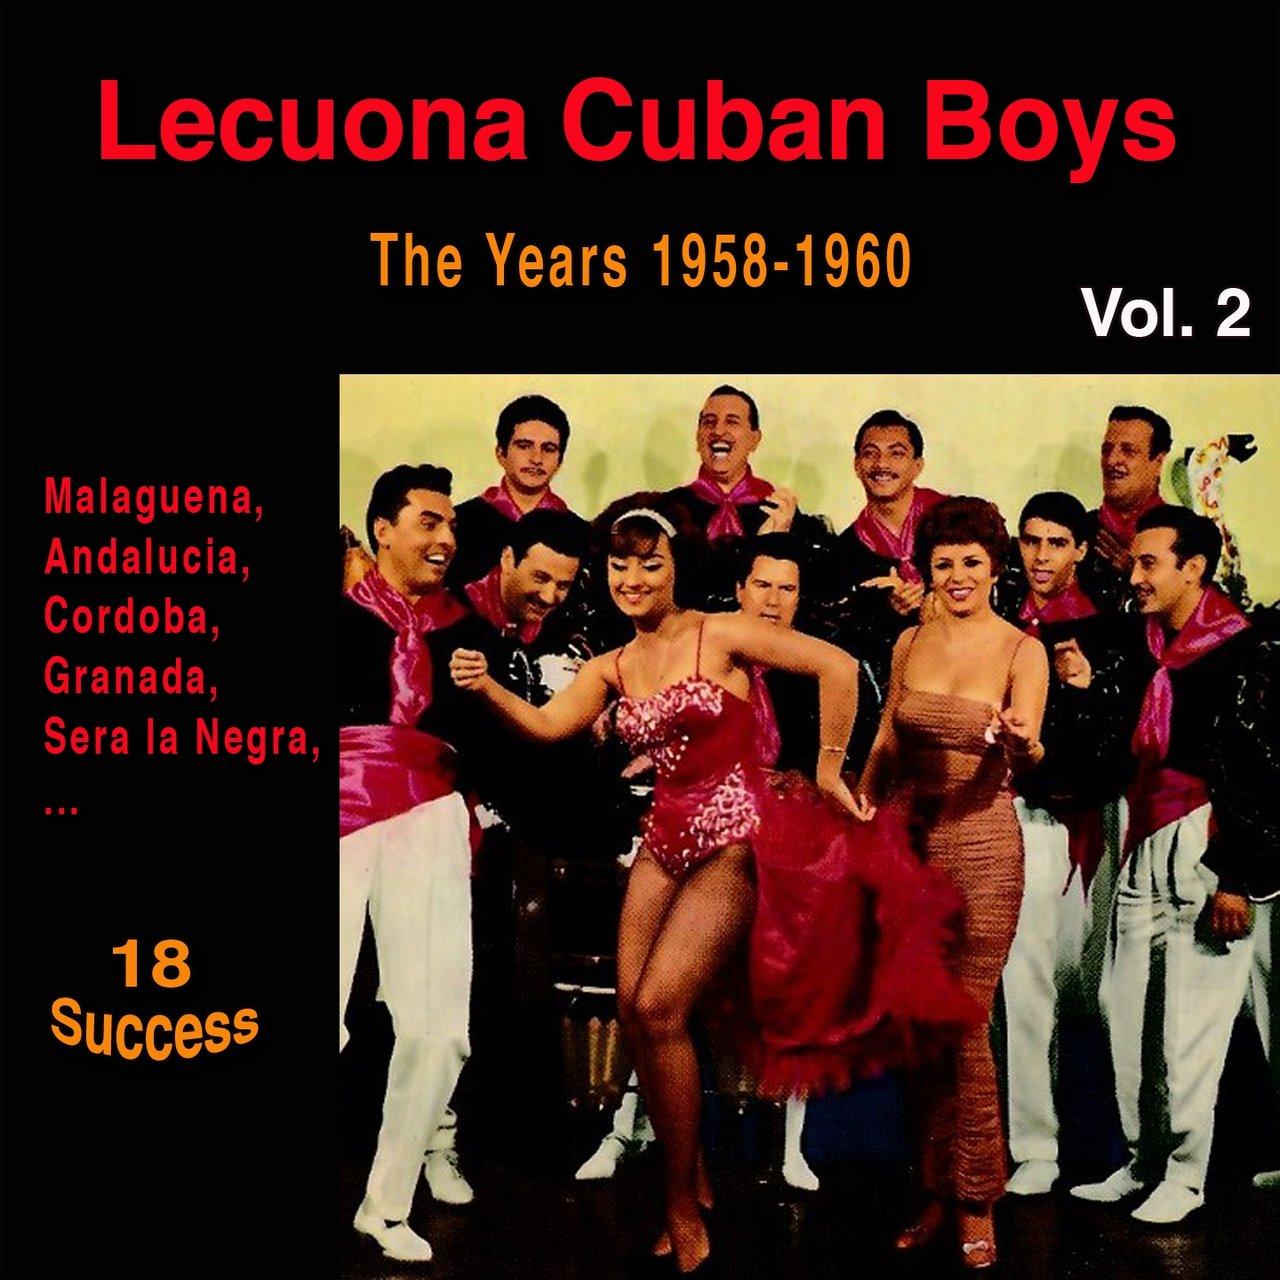 Cuban boys, busty girls suck